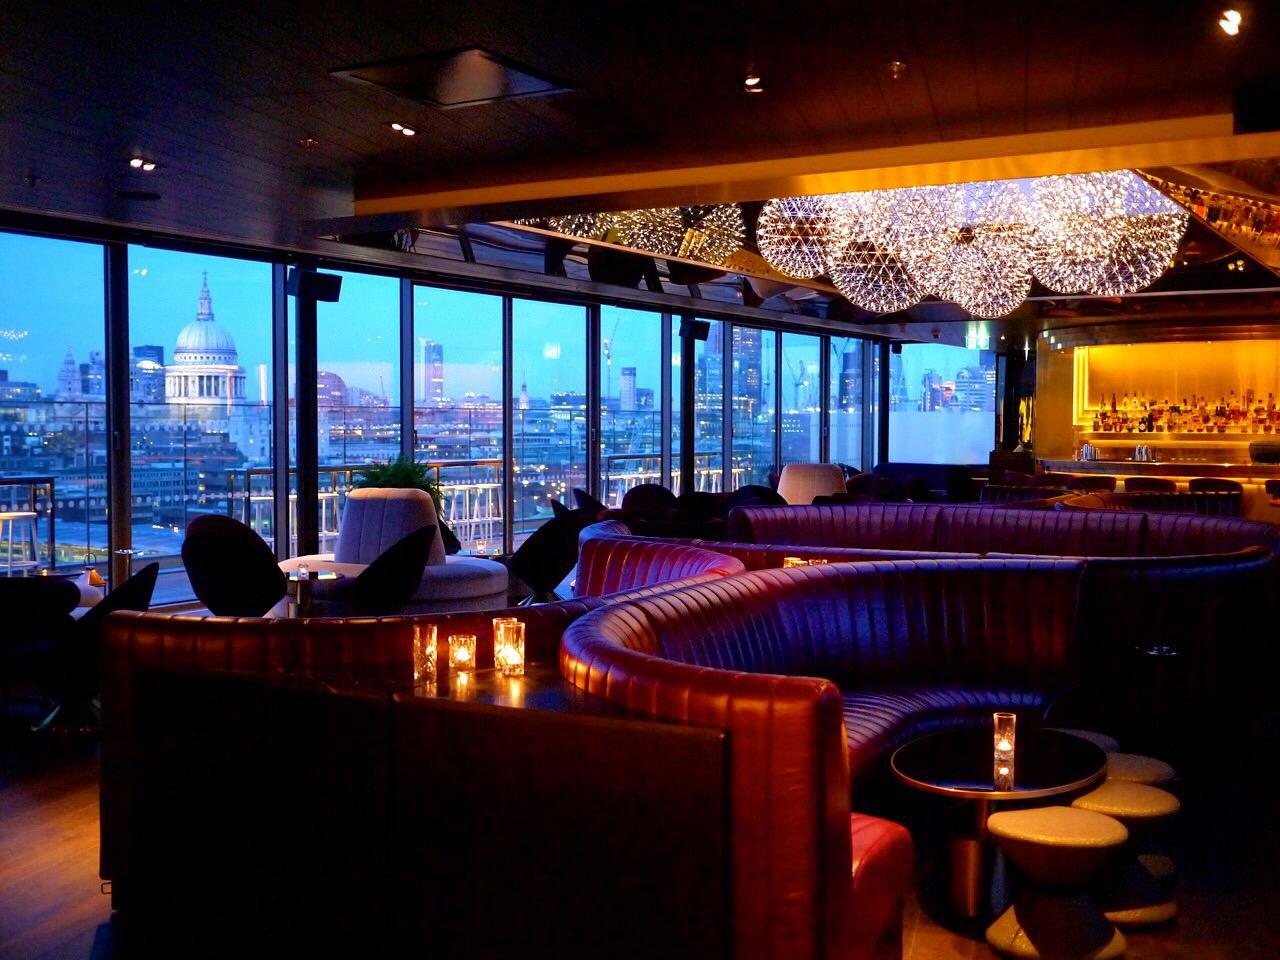 Sea Containers & Rumpus Room at the Mondrian Hotel – London – Gin & Bone